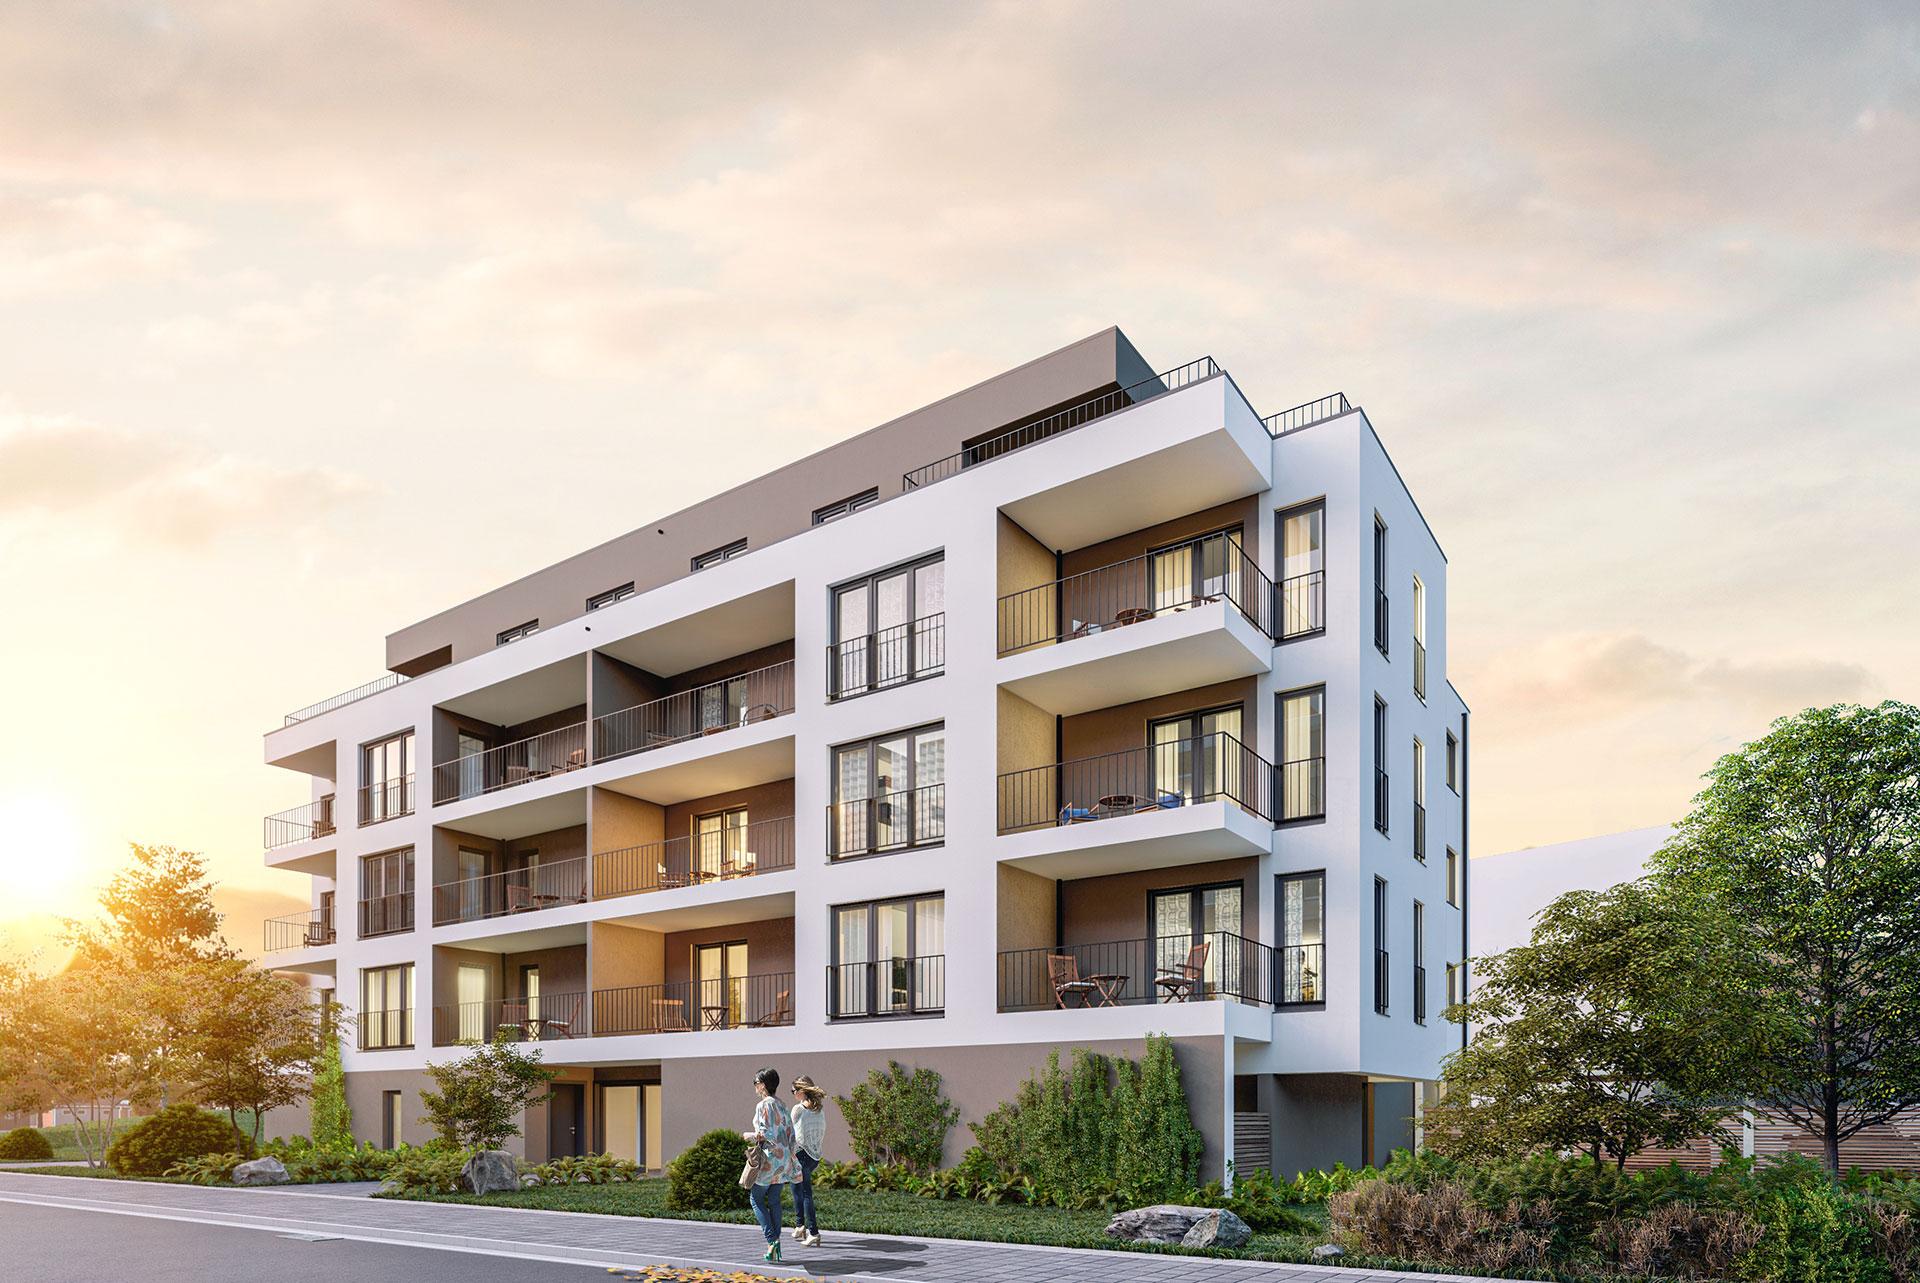 VERKAUFSSTART unseres neuen Mehrfamilienhaus-Projektes am Drosselberg